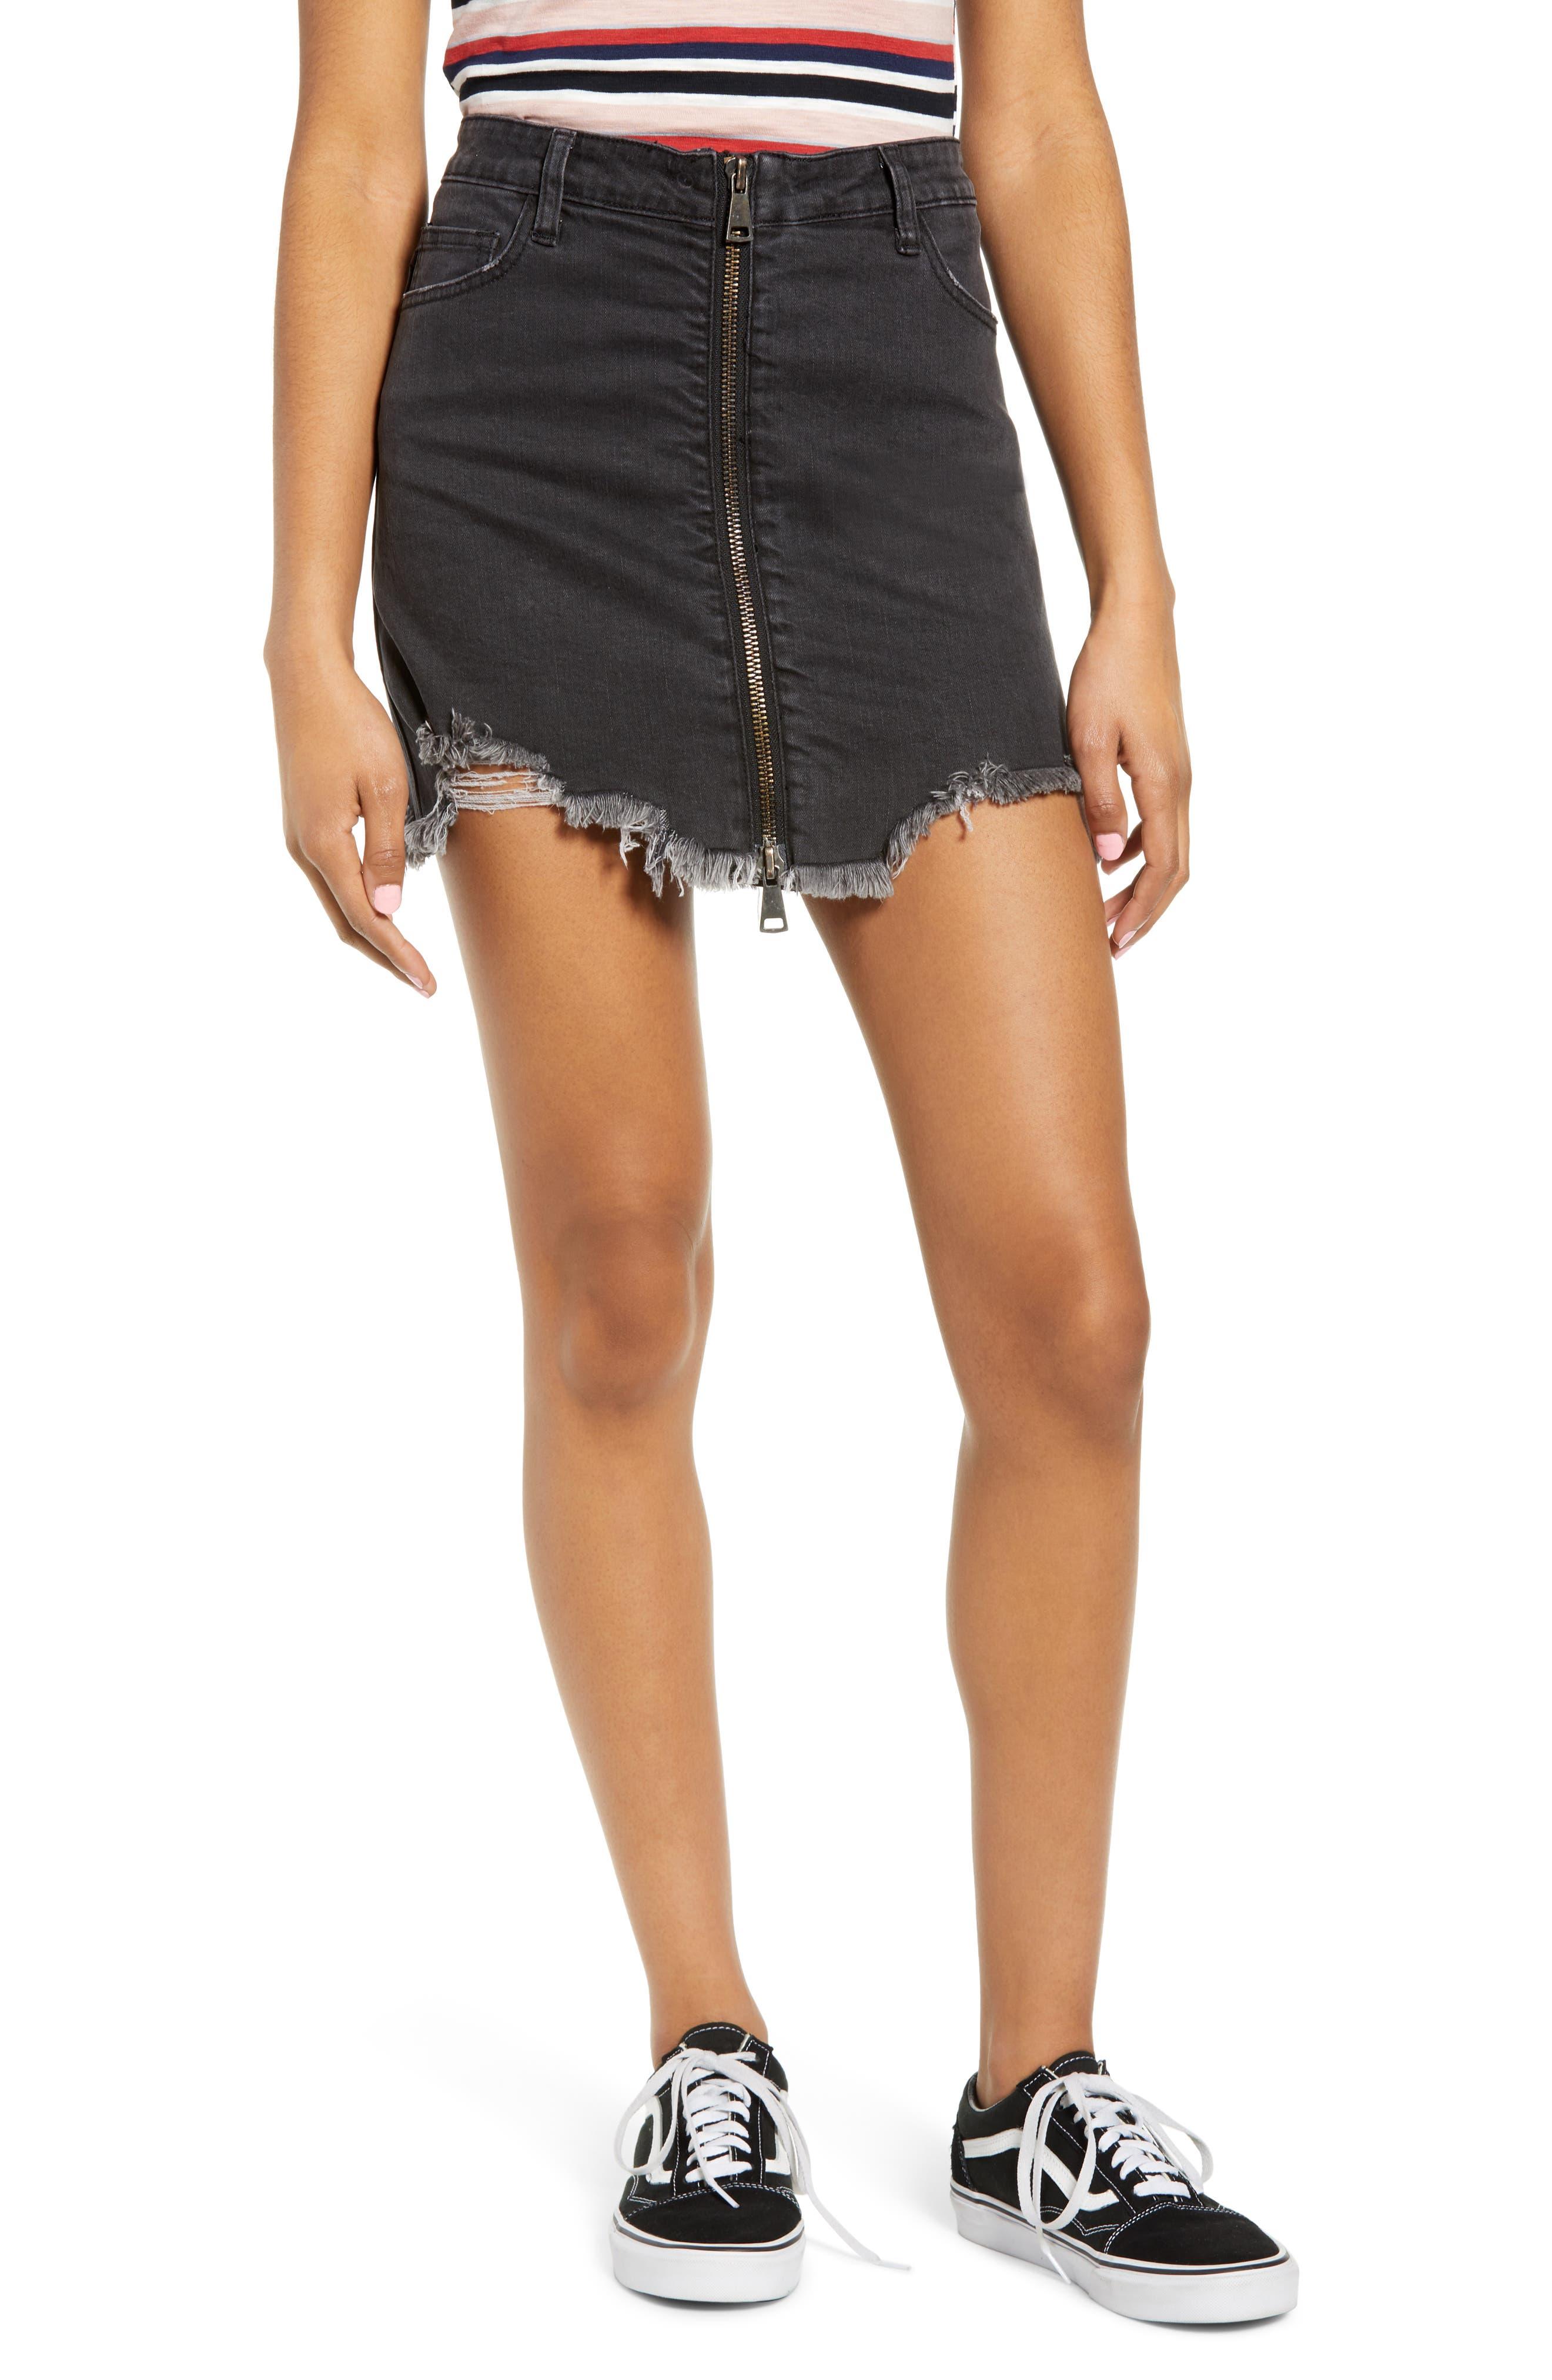 Lira Clothing Cobra Ripped Denim Skirt, Black